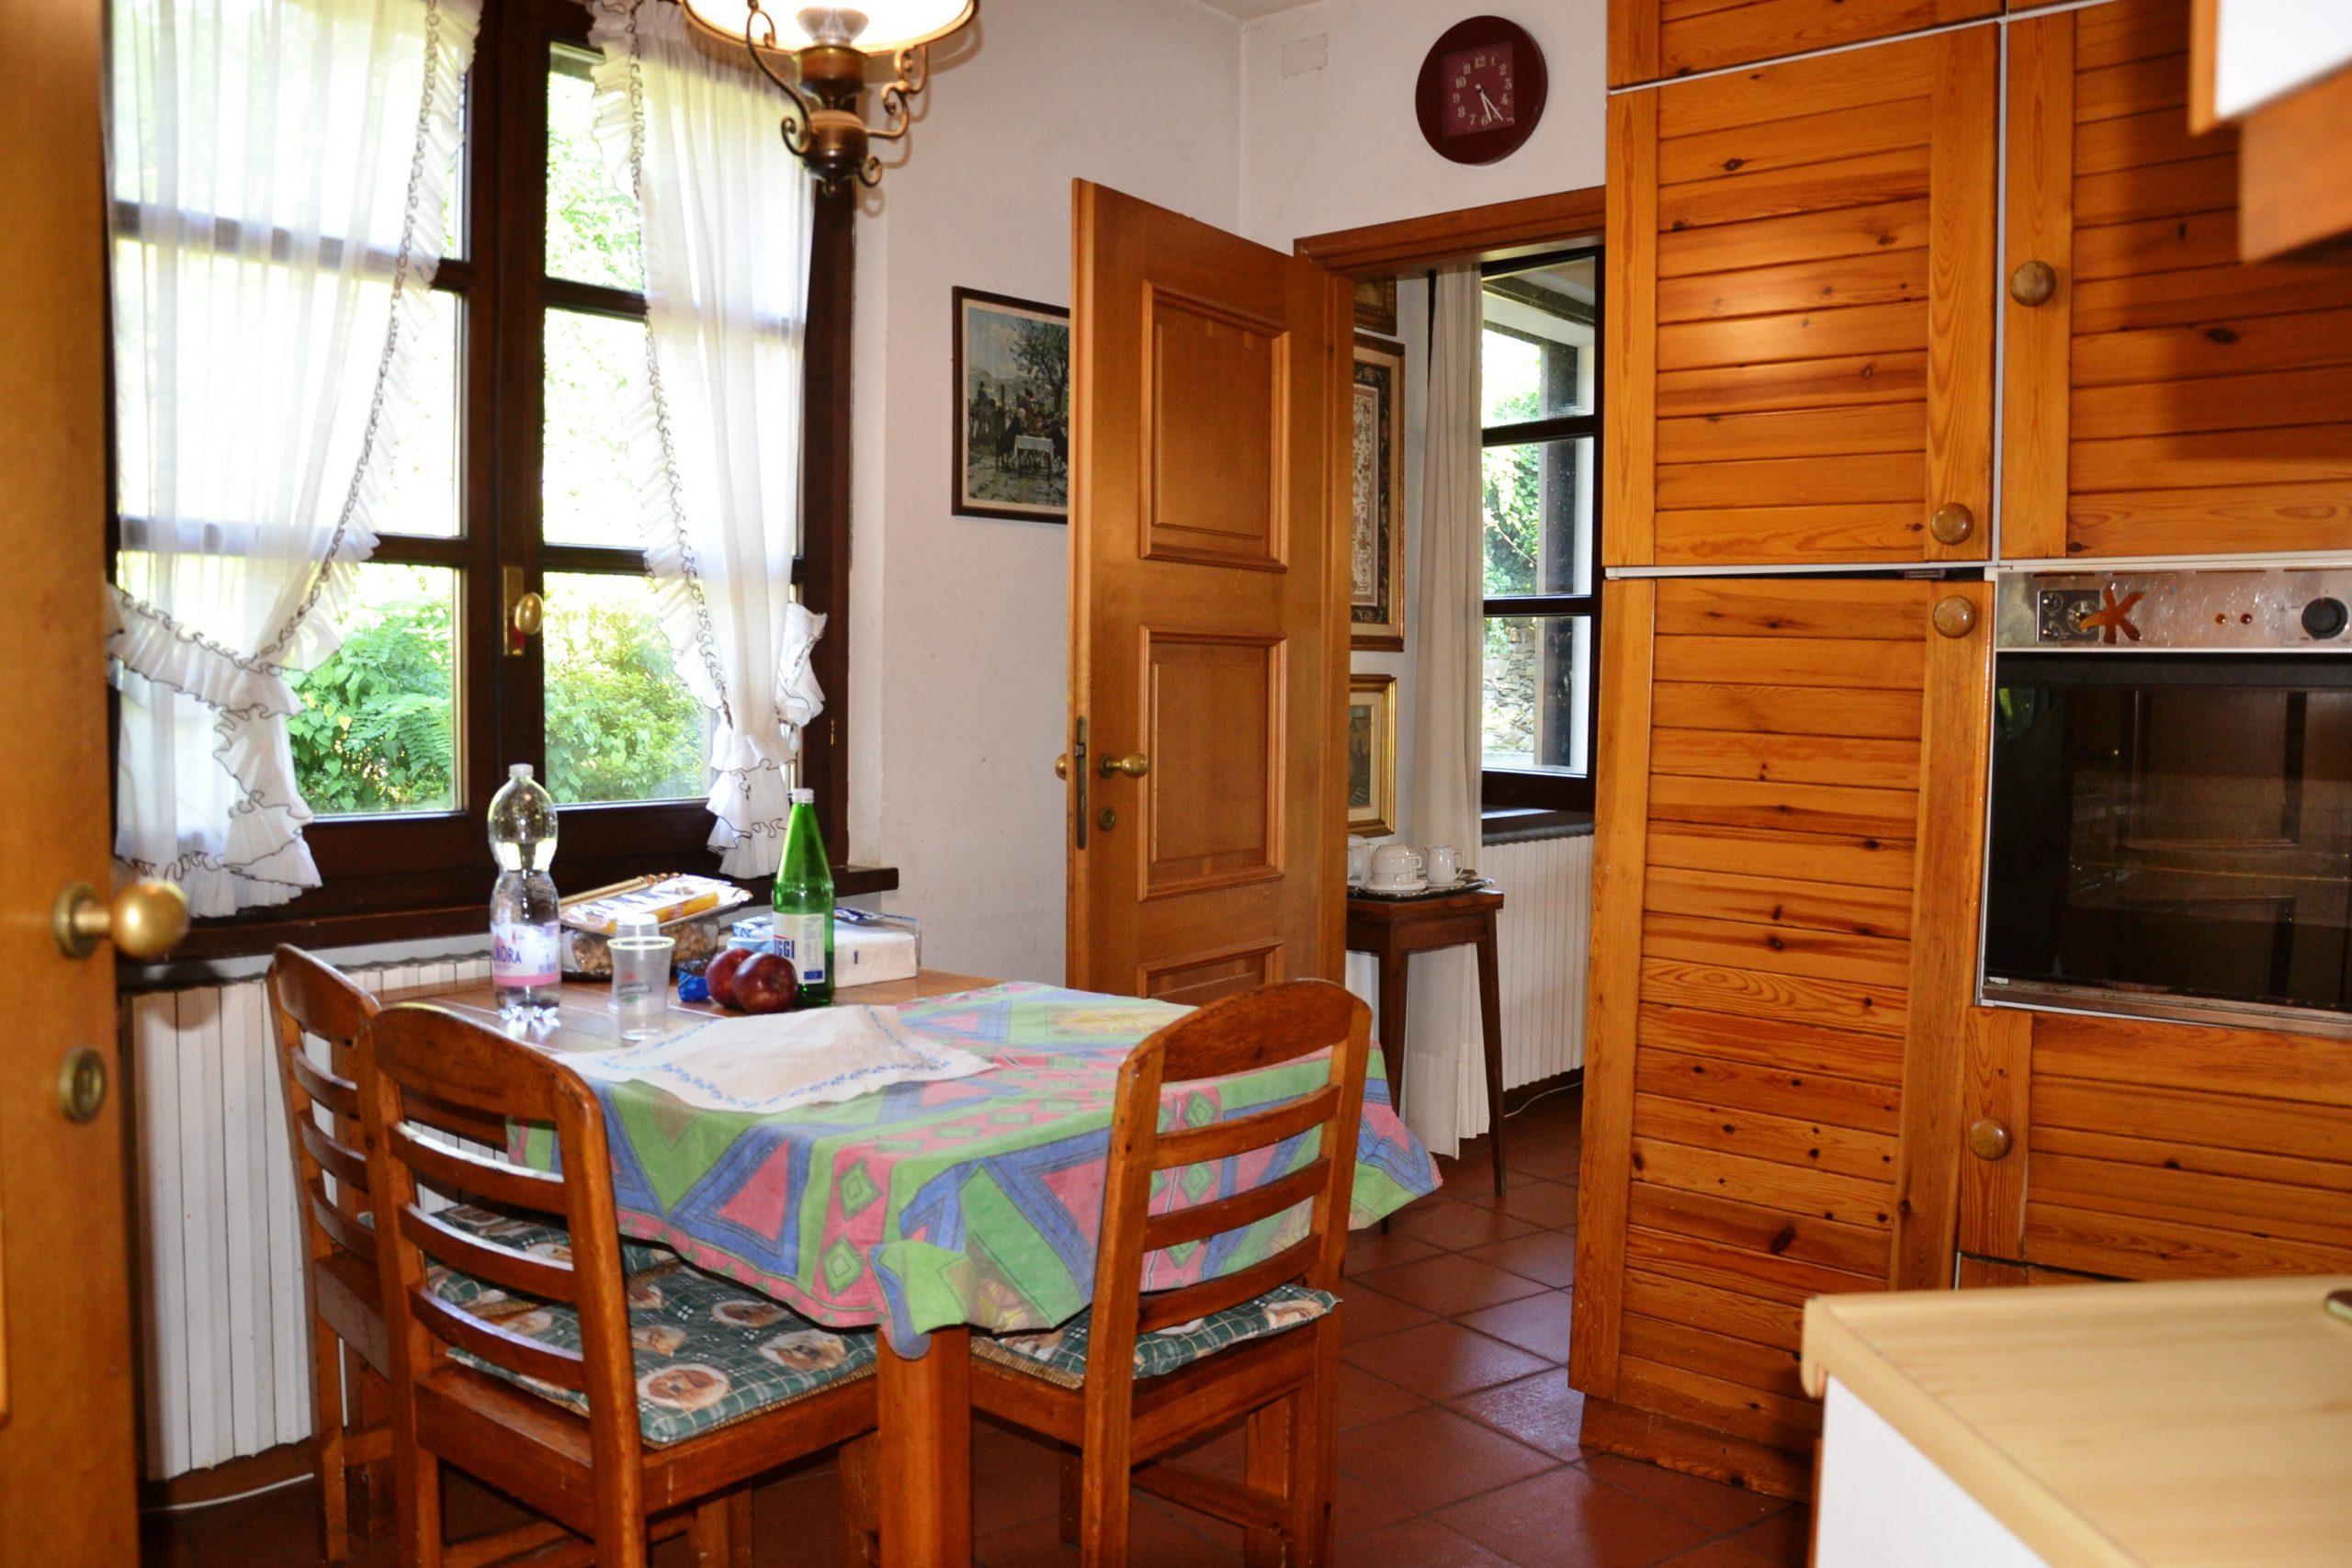 Foto Villa con generoso giardino e vista lago, Verbania